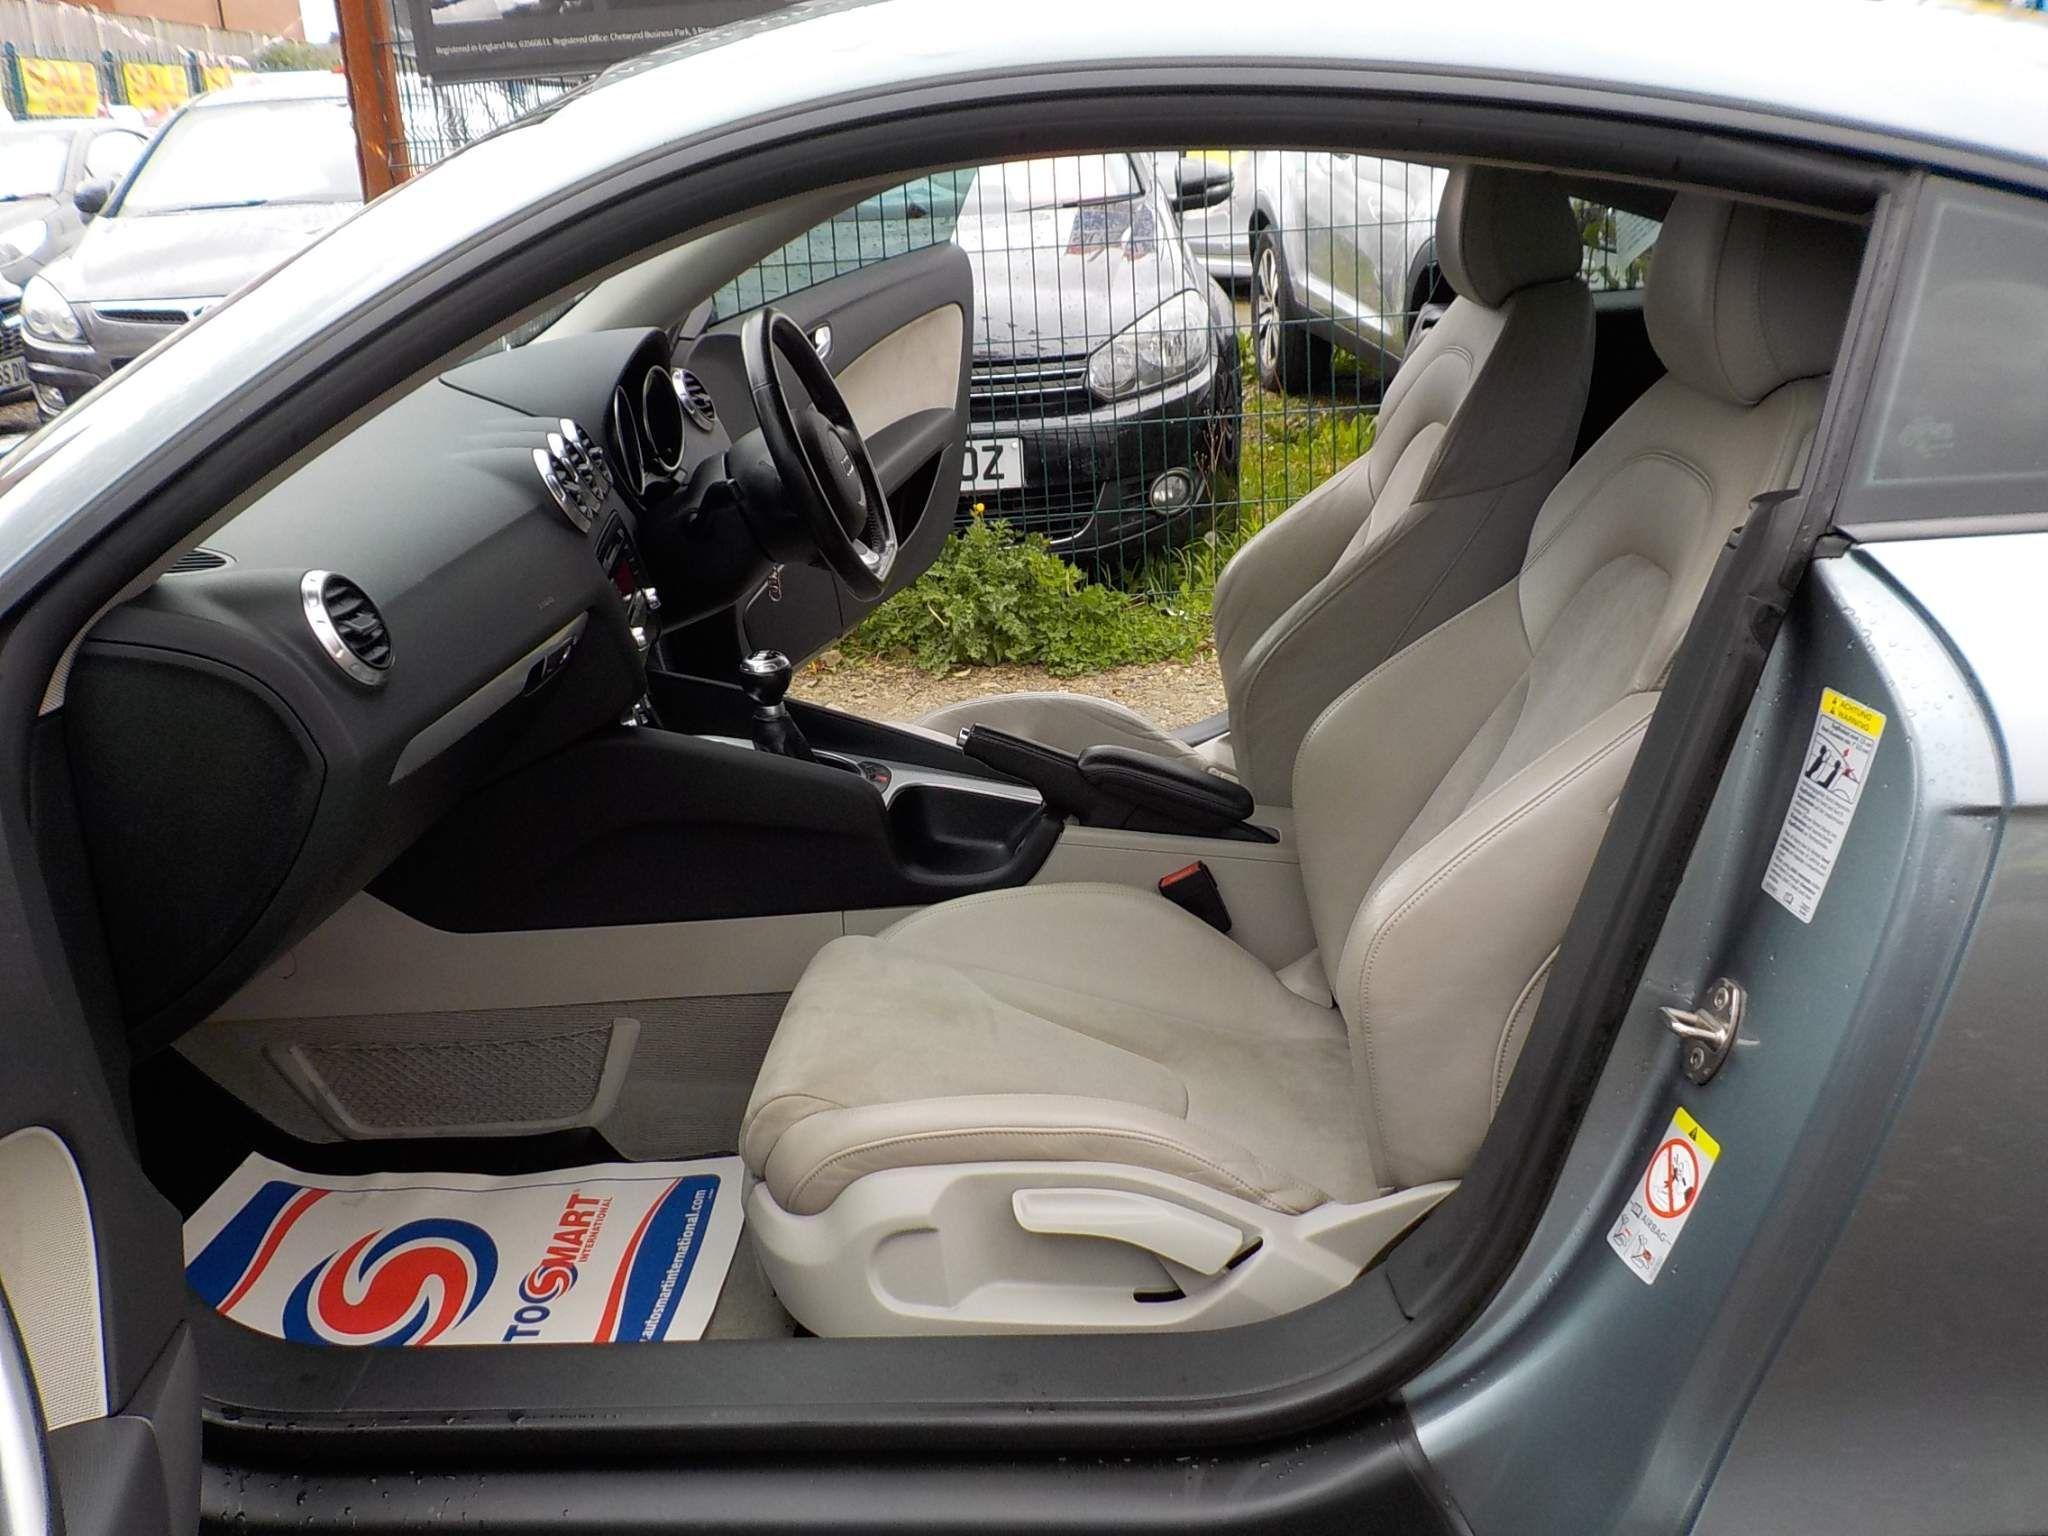 Audi TT 2.0 TFSI 2dr